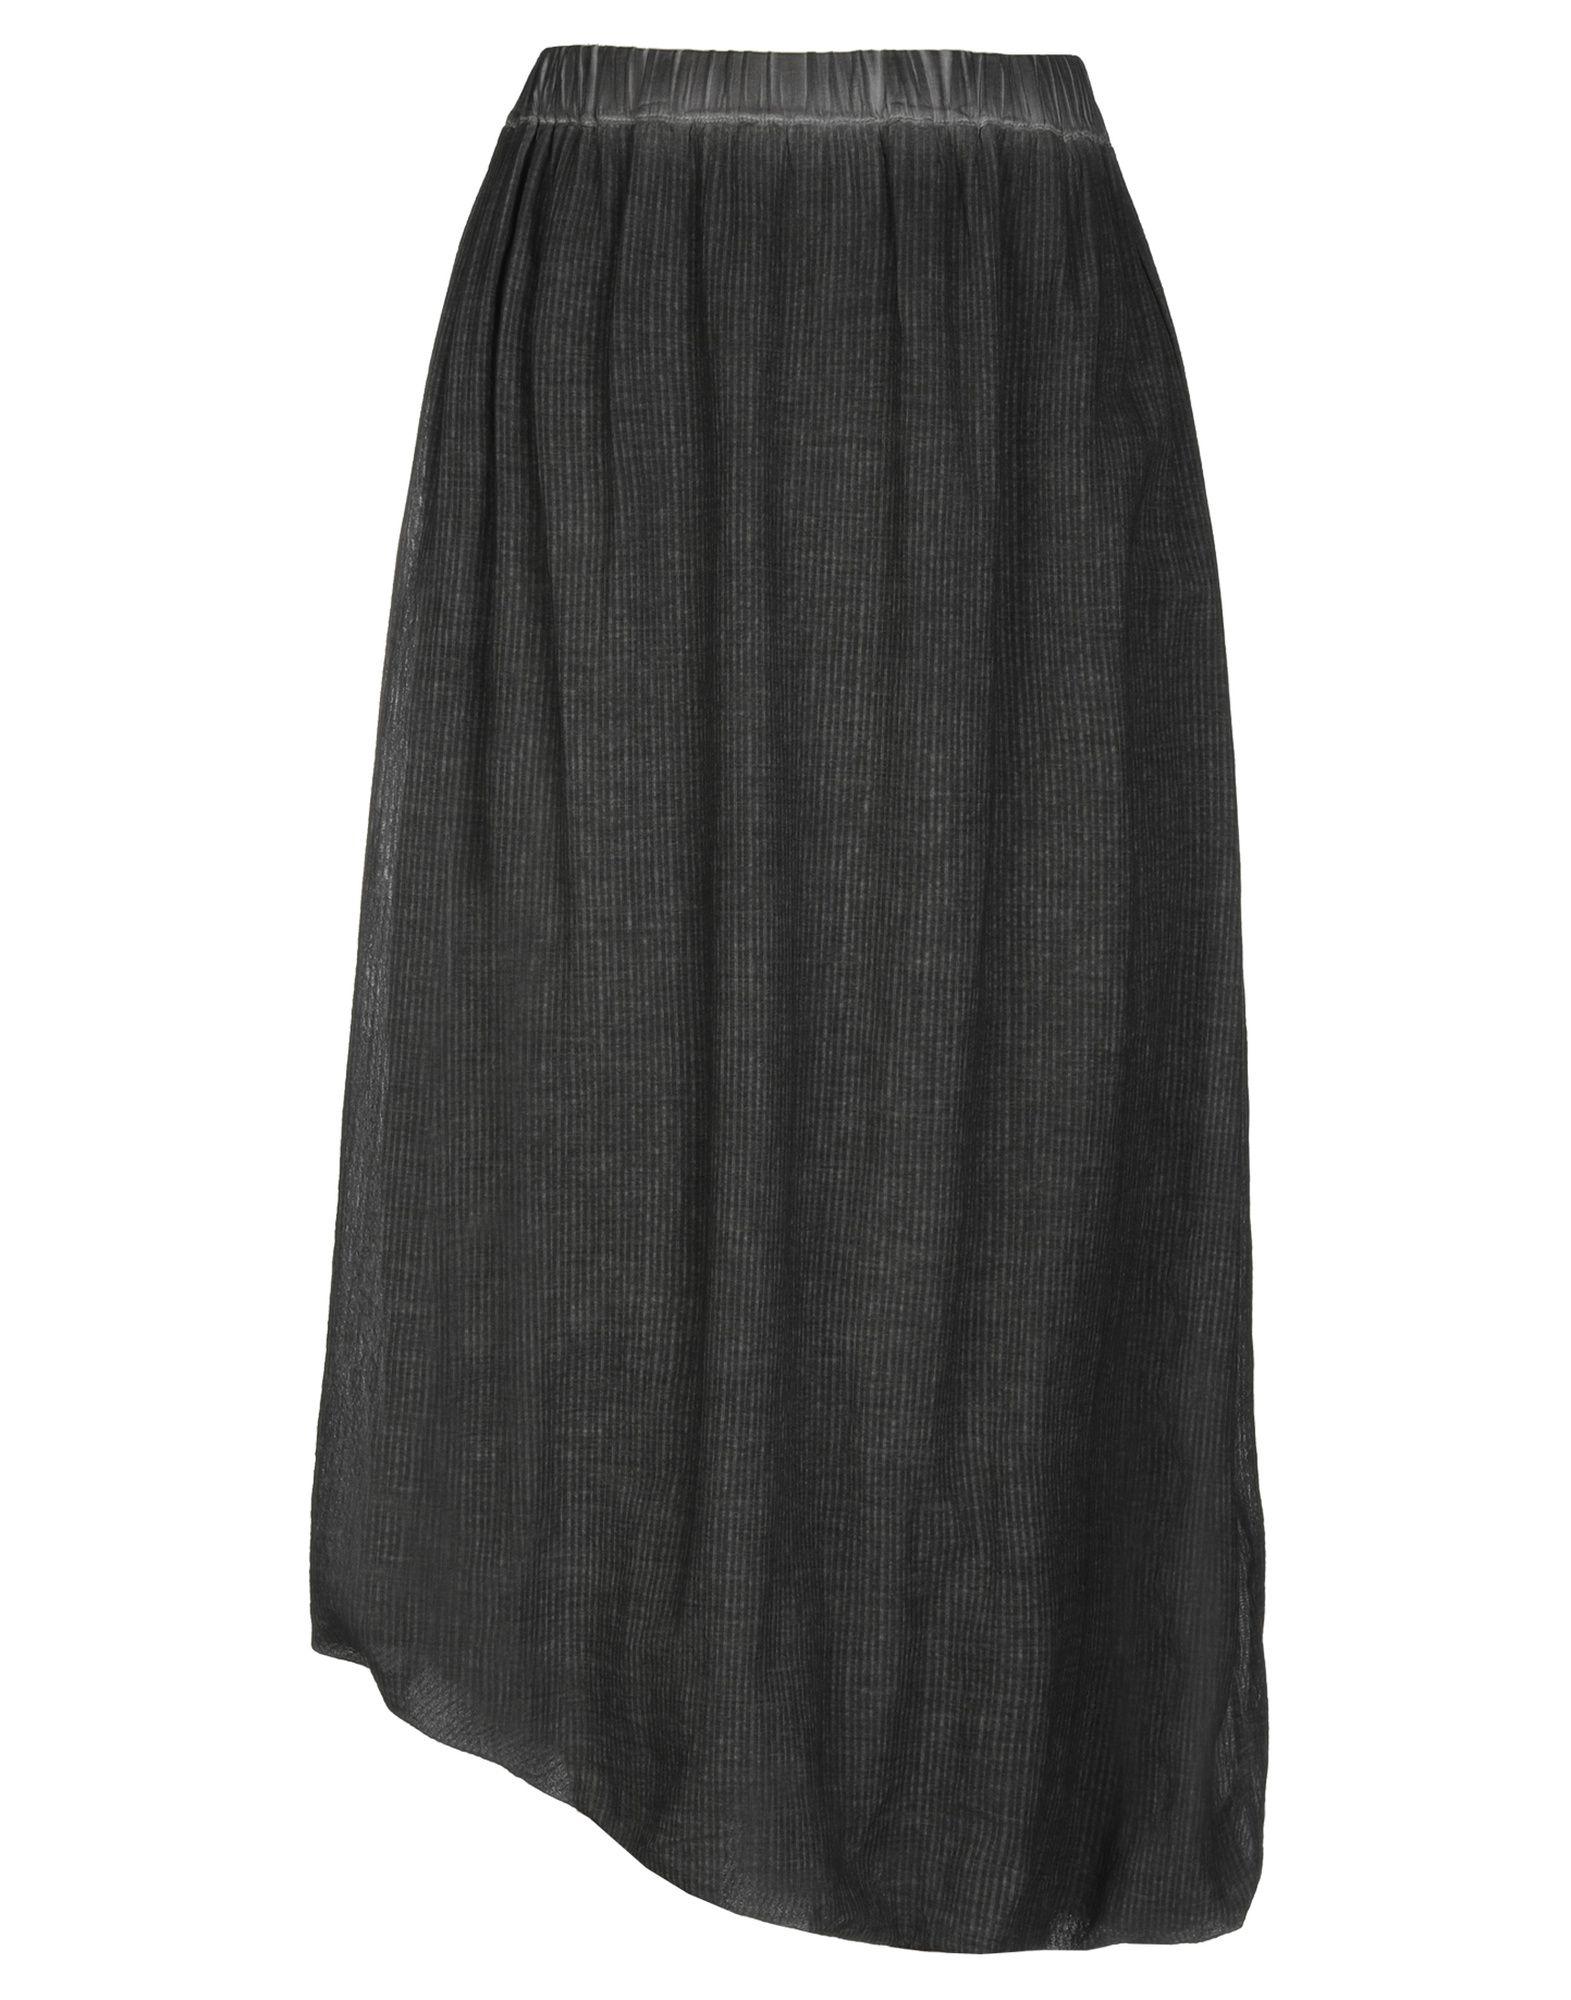 UN-NAMABLE Юбка длиной 3/4 pianurastudio юбка длиной 3 4